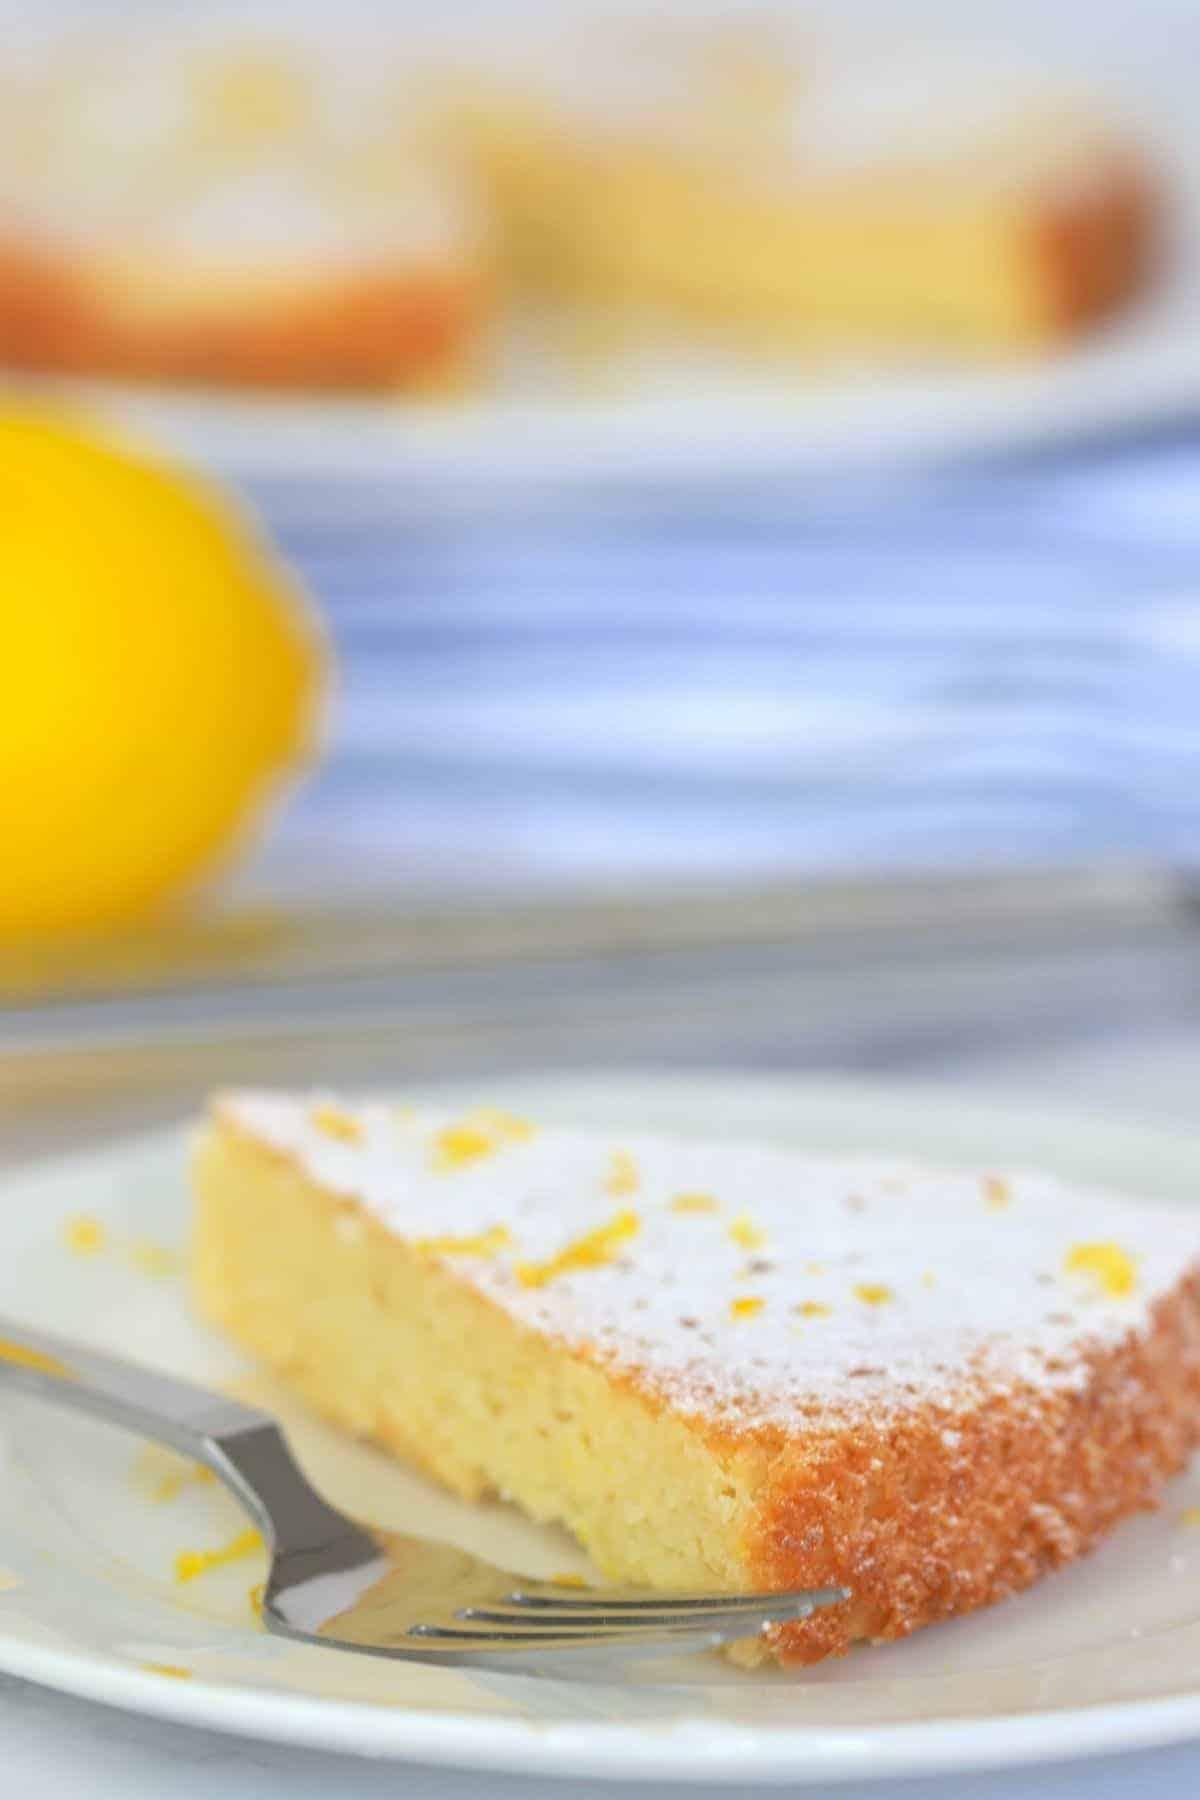 Lemon cake on a plate next to a lemon and lemon zester